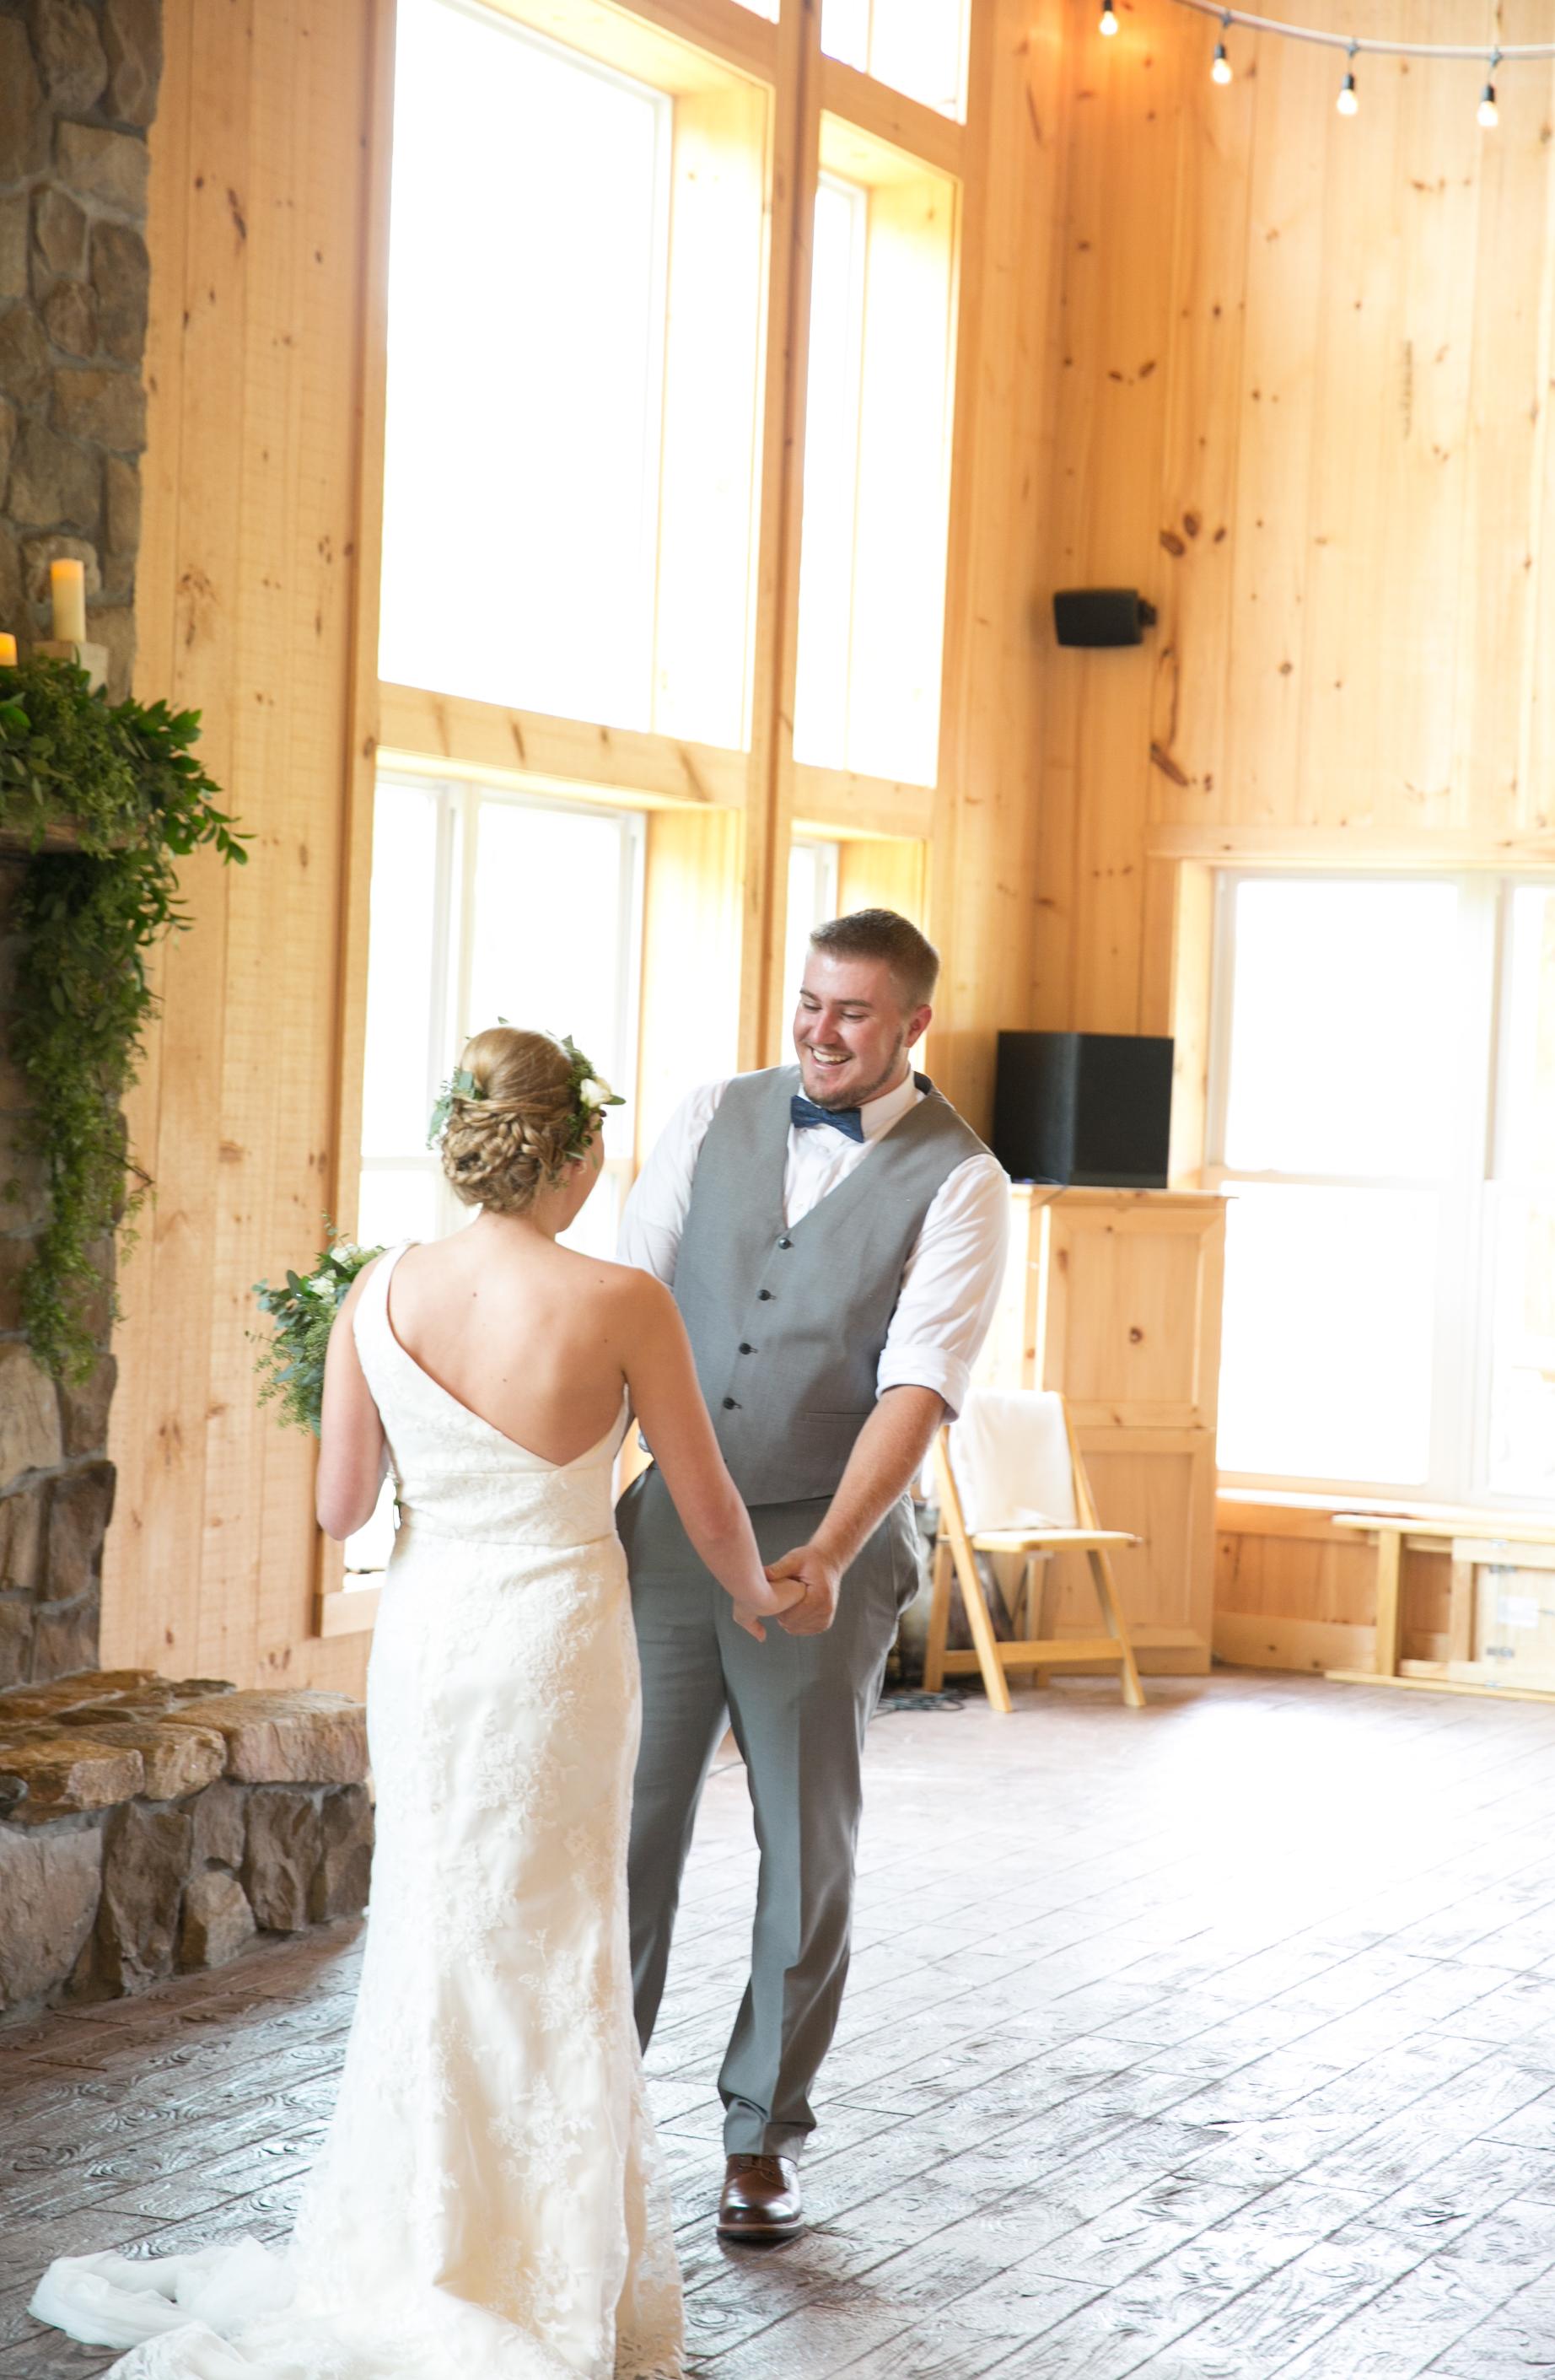 Luke_Sarah_Calaway_Wedding_12Aug17_0188.jpg